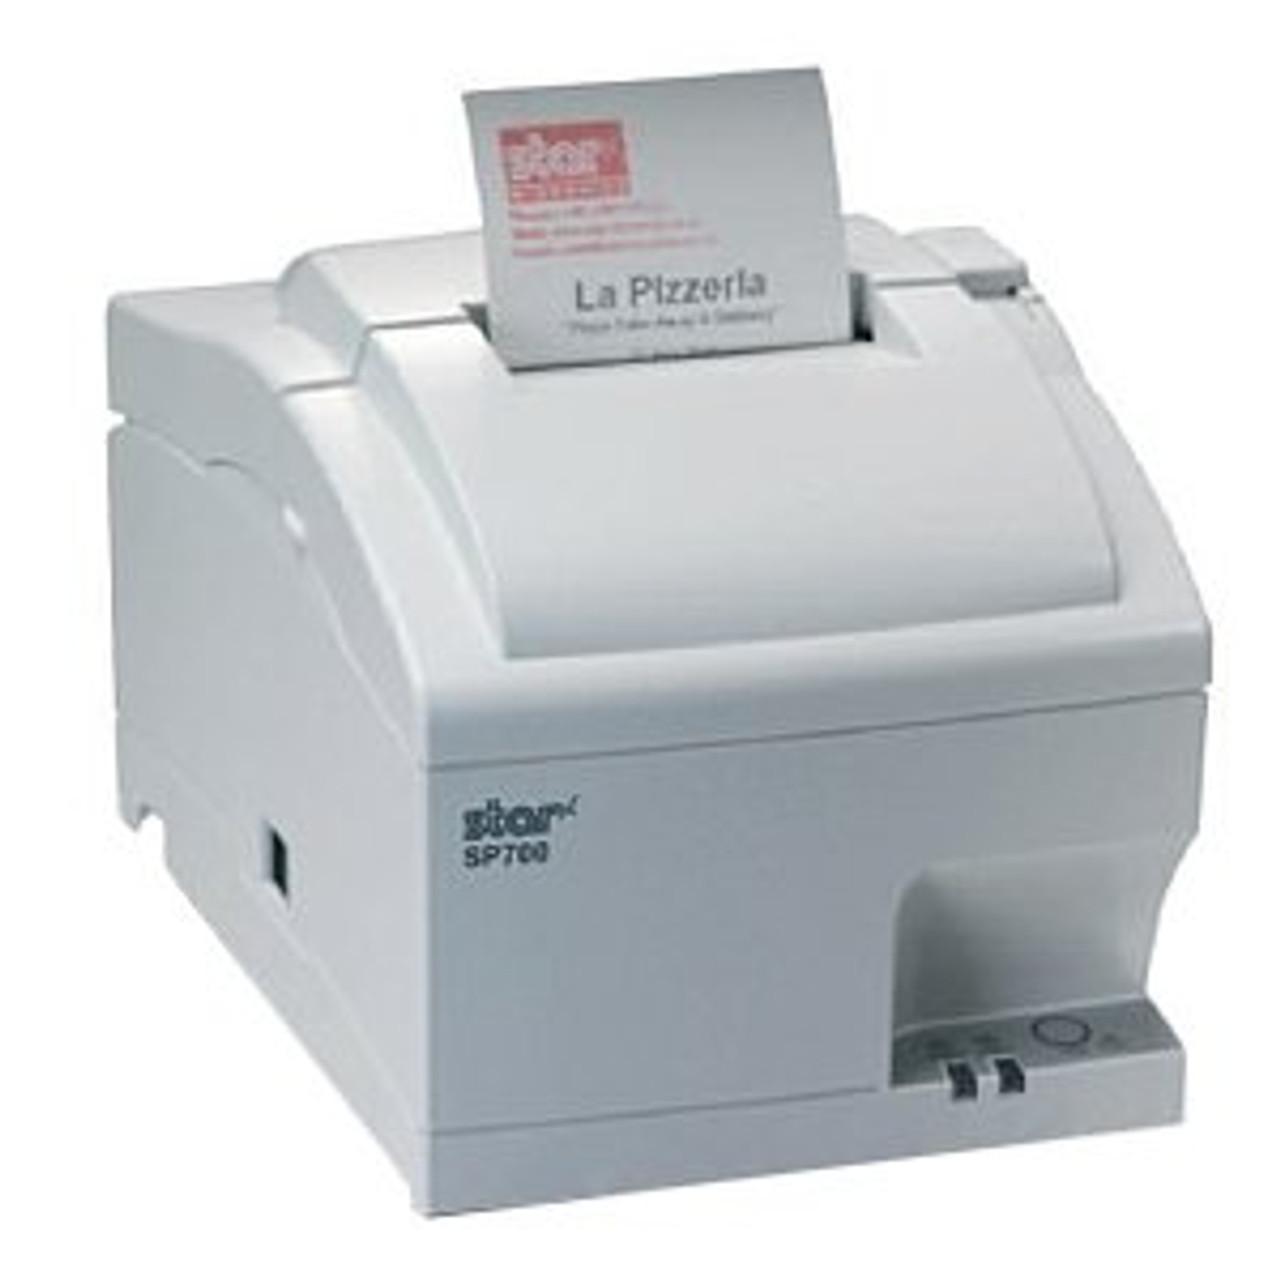 Star SP700 POS Impact Printer, SP712MD